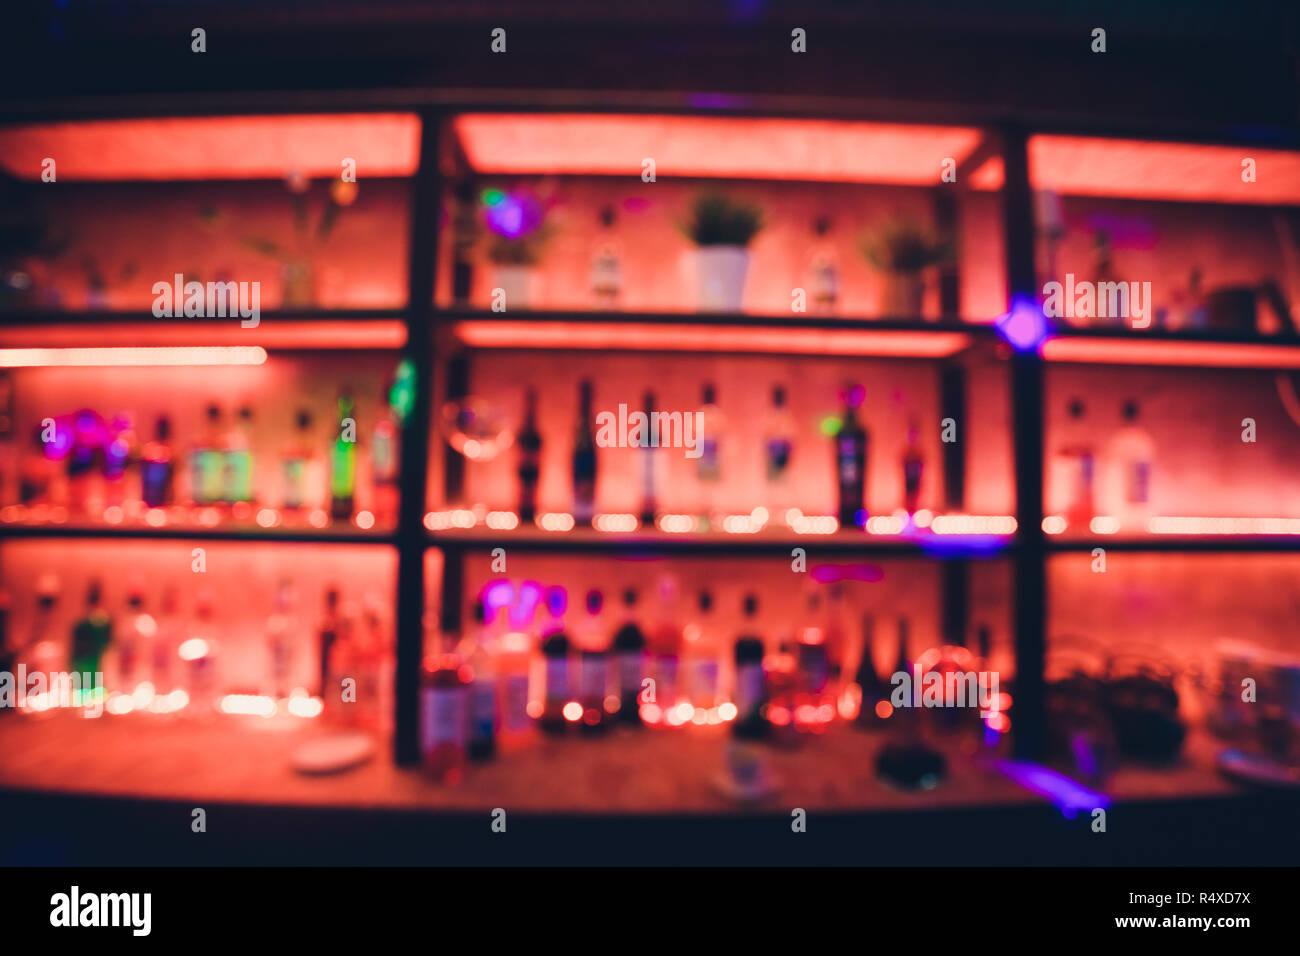 Blur Alcohol Drink Bottle At Club Pub Or Bar In Dark Party Night